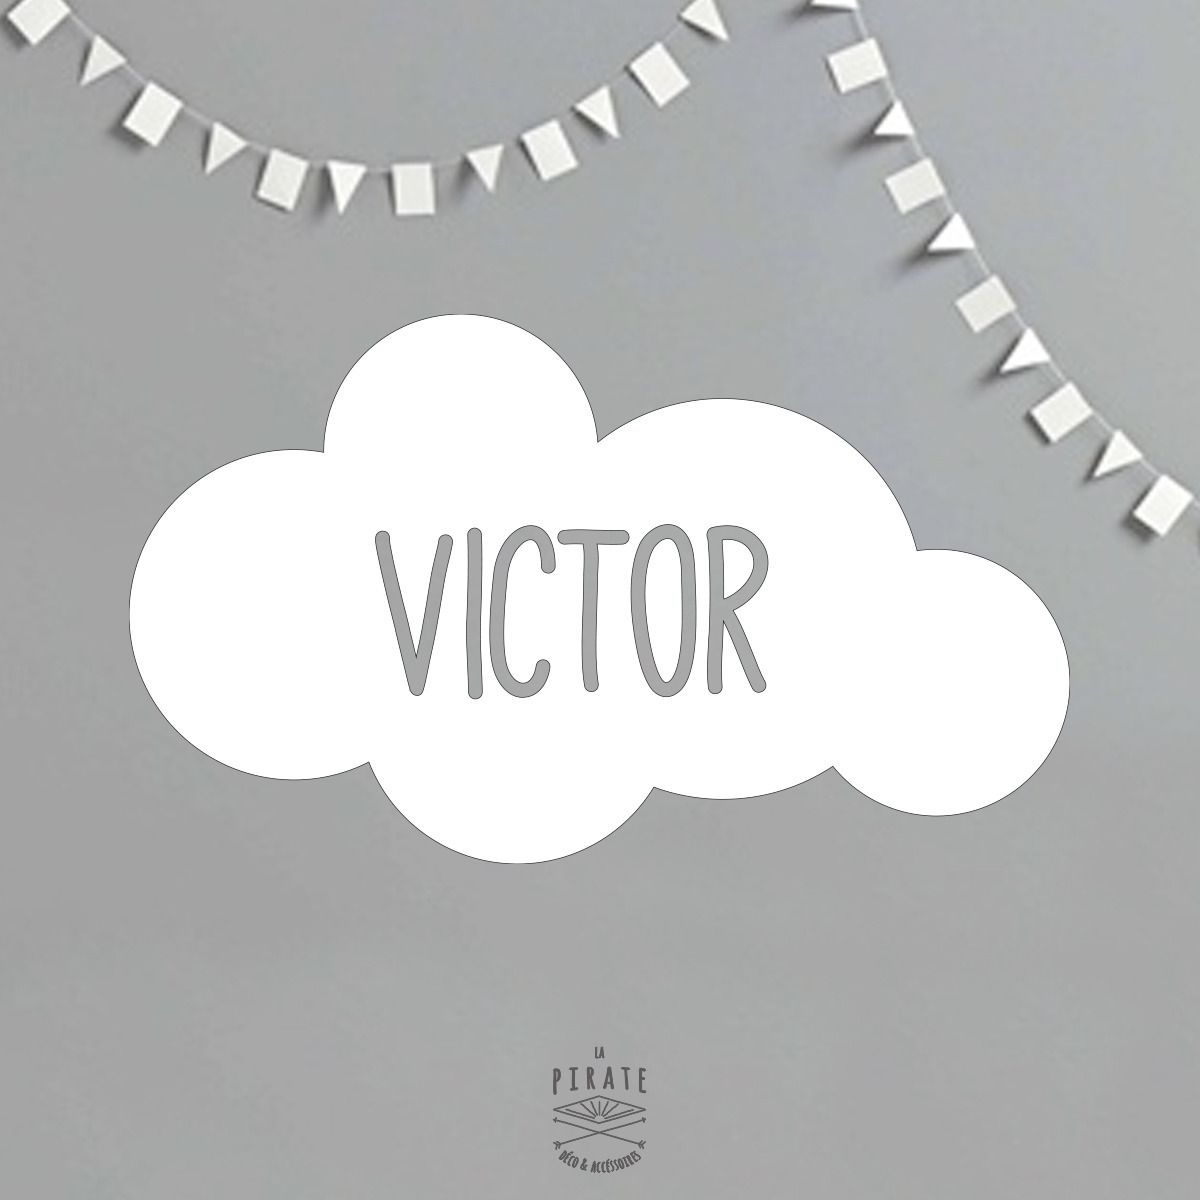 Id e cadeau no l le stickers nuage personnalis 30x18cm chambre b b chambre d 39 enfant de - Stickers chambre bebe nuage ...